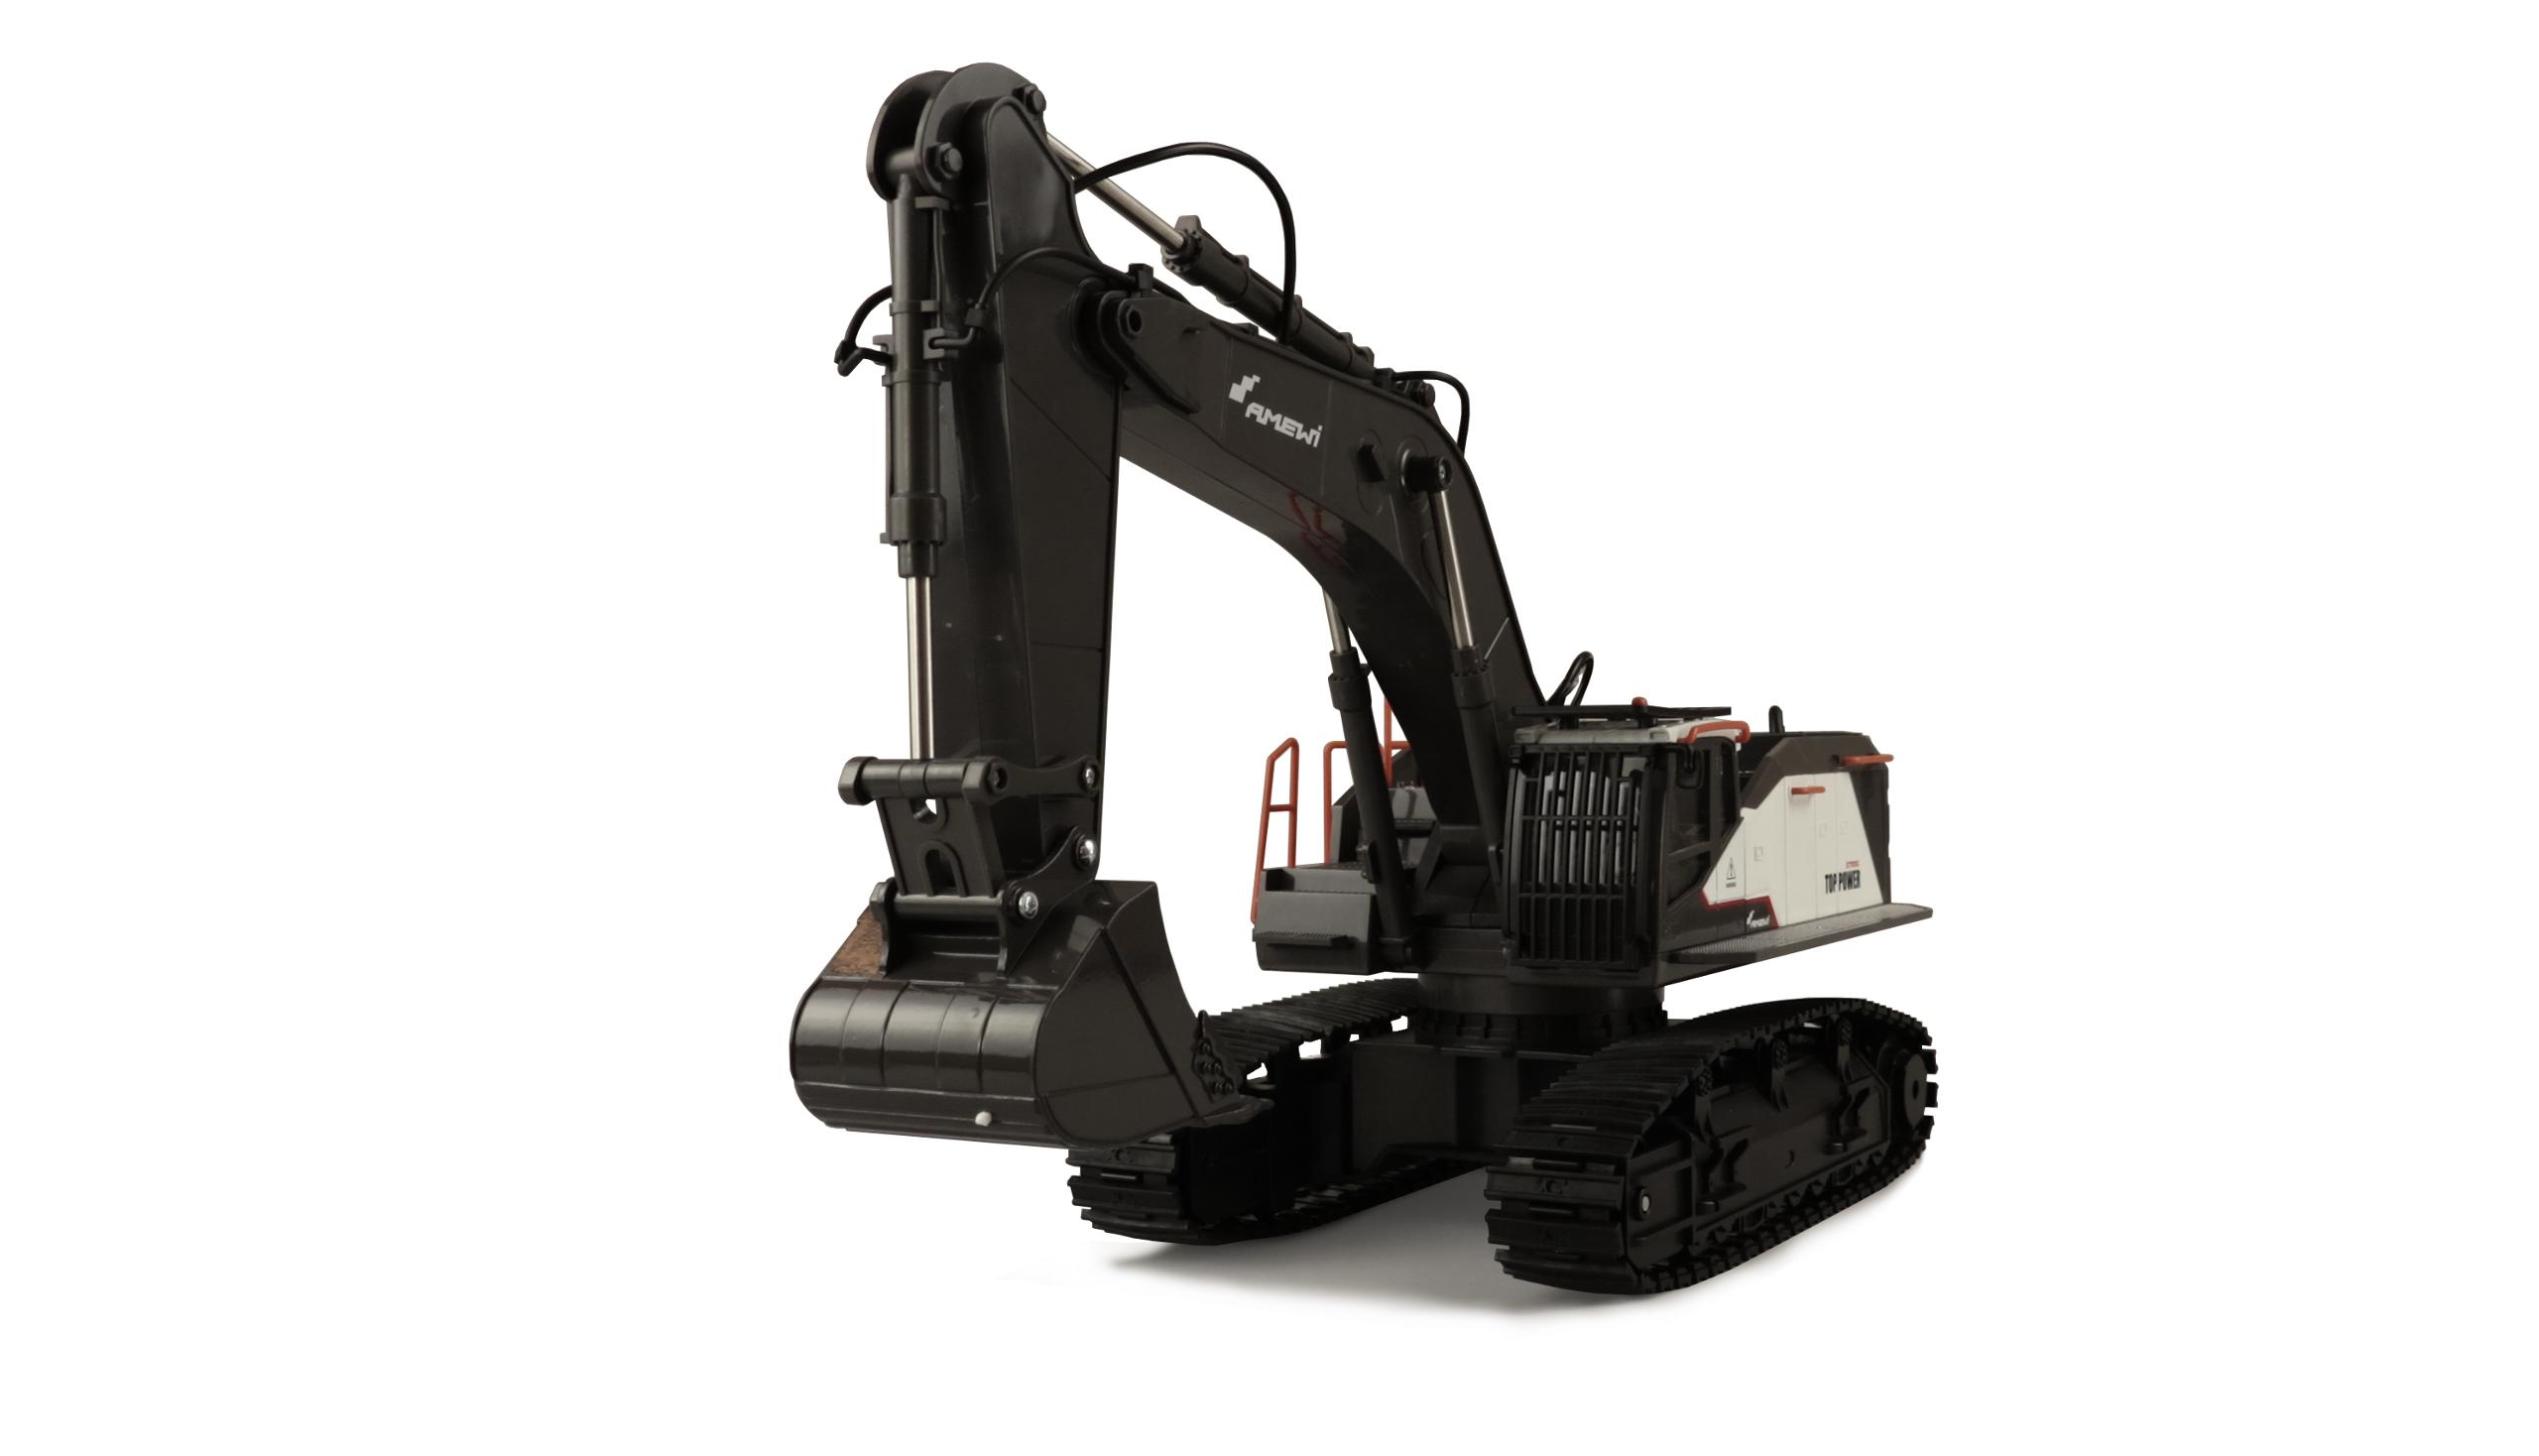 Amewi Raupenbagger ACV730 - Traktor - 1:14 - Junge - 8 Jahr(e) - 1200 mAh - 2,33 kg